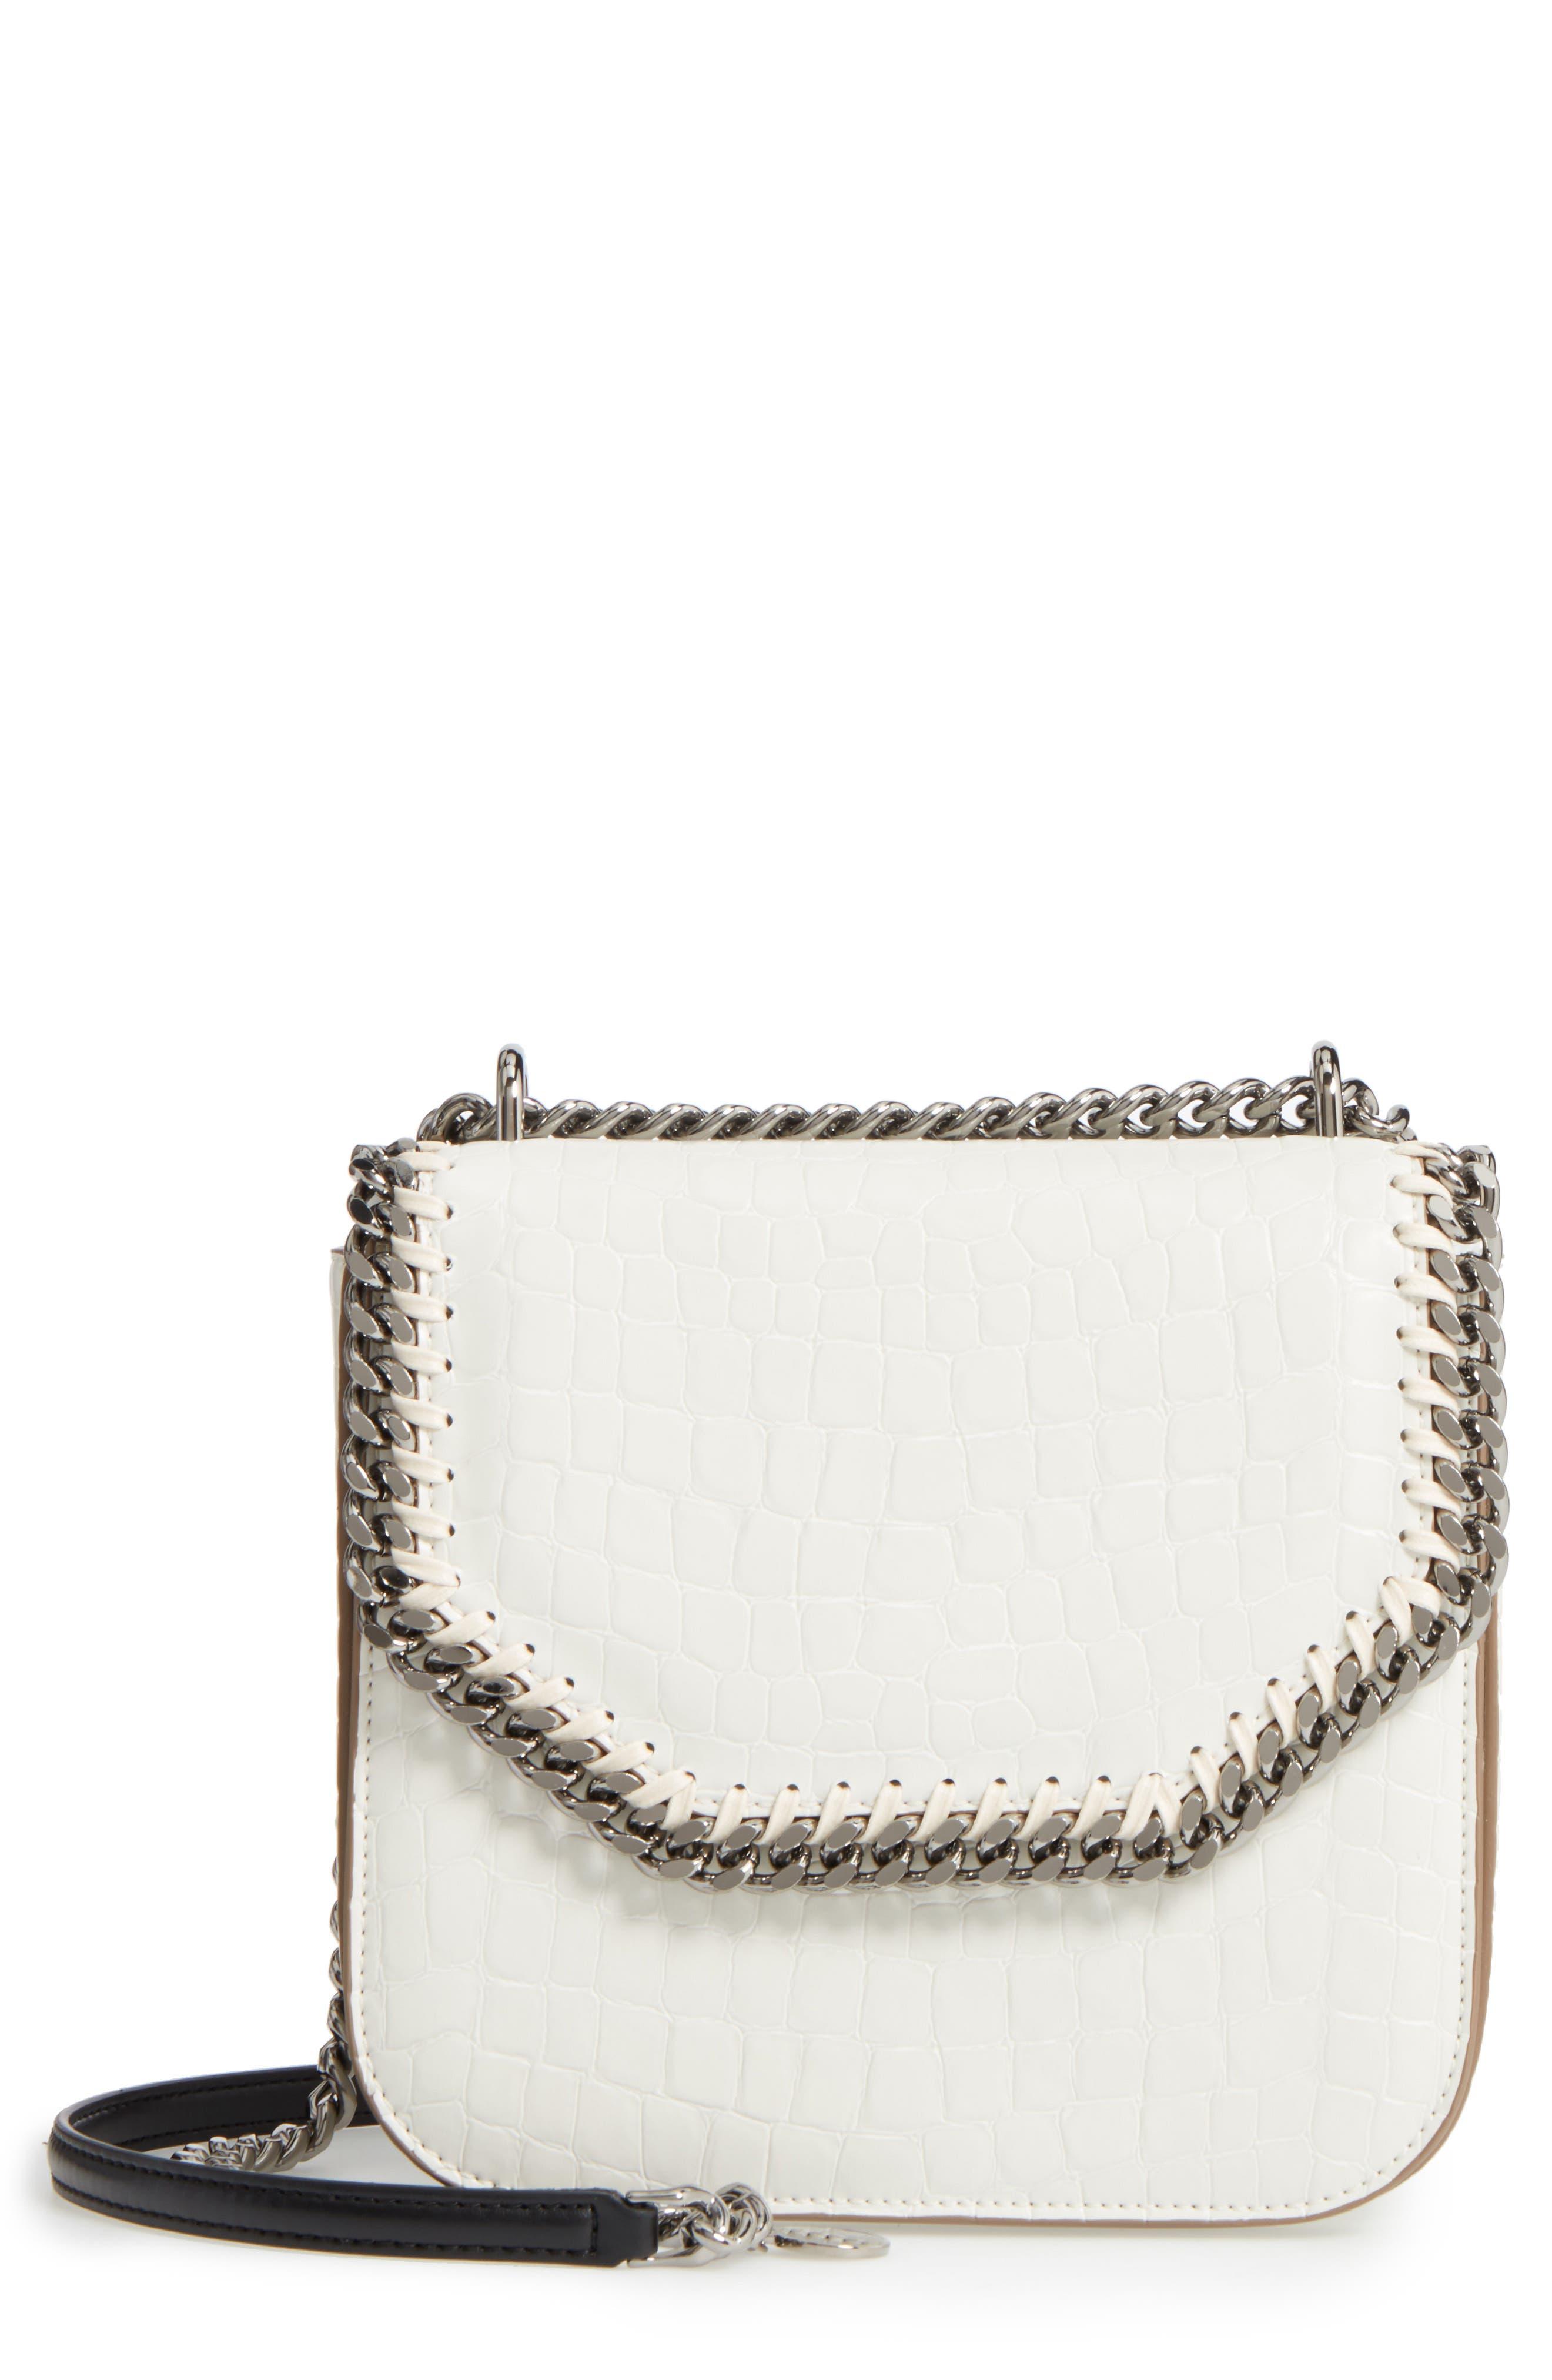 Stella McCartney Medium Falabella Box Croc-Embossed Faux Leather Shoulder Bag